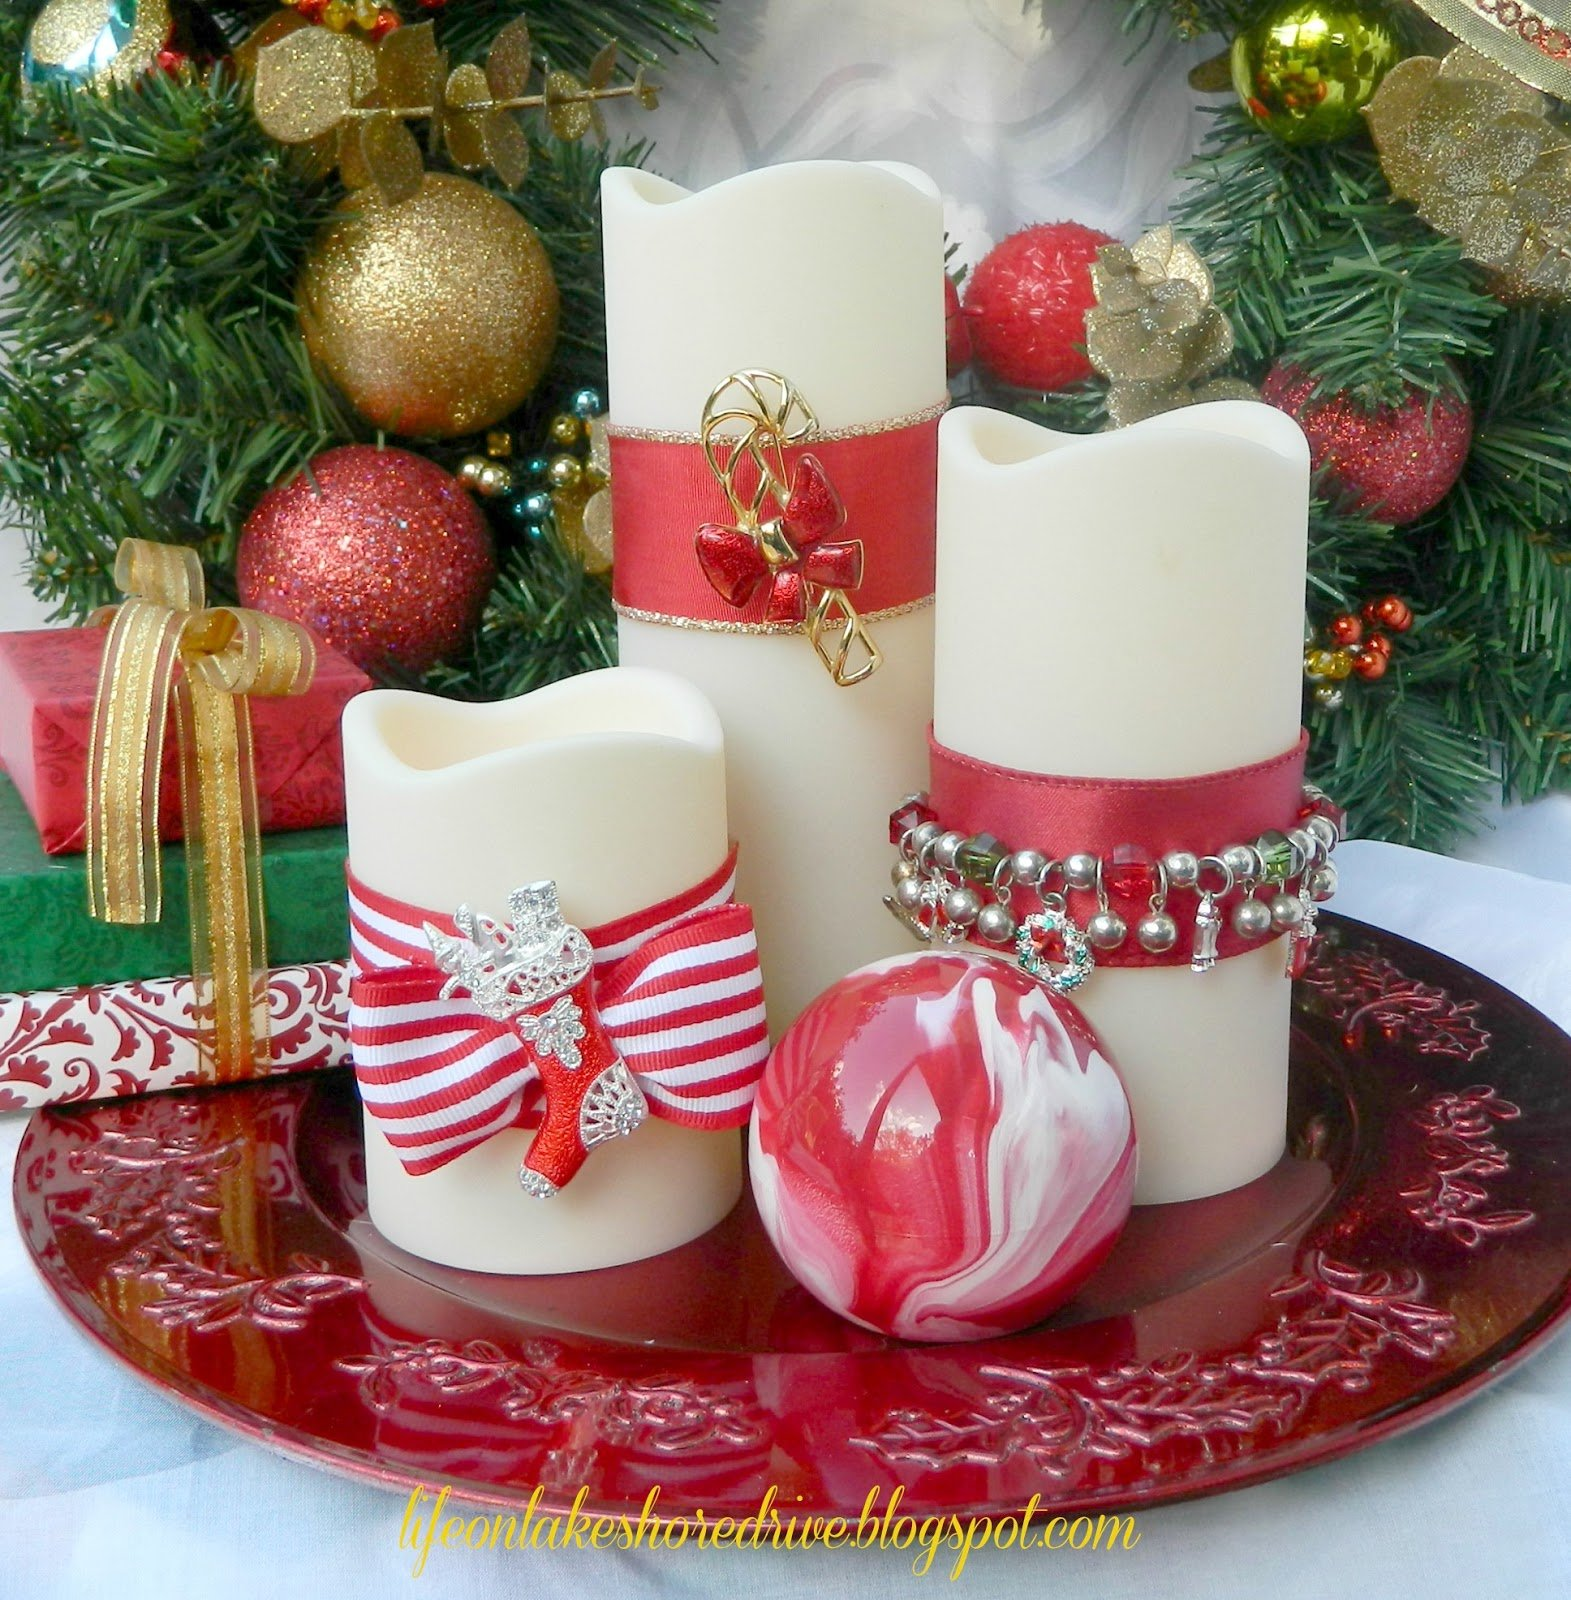 Best Christmas Decoration Malaysia 2013: 10+1 ötlet ünnepi Gyertyákra